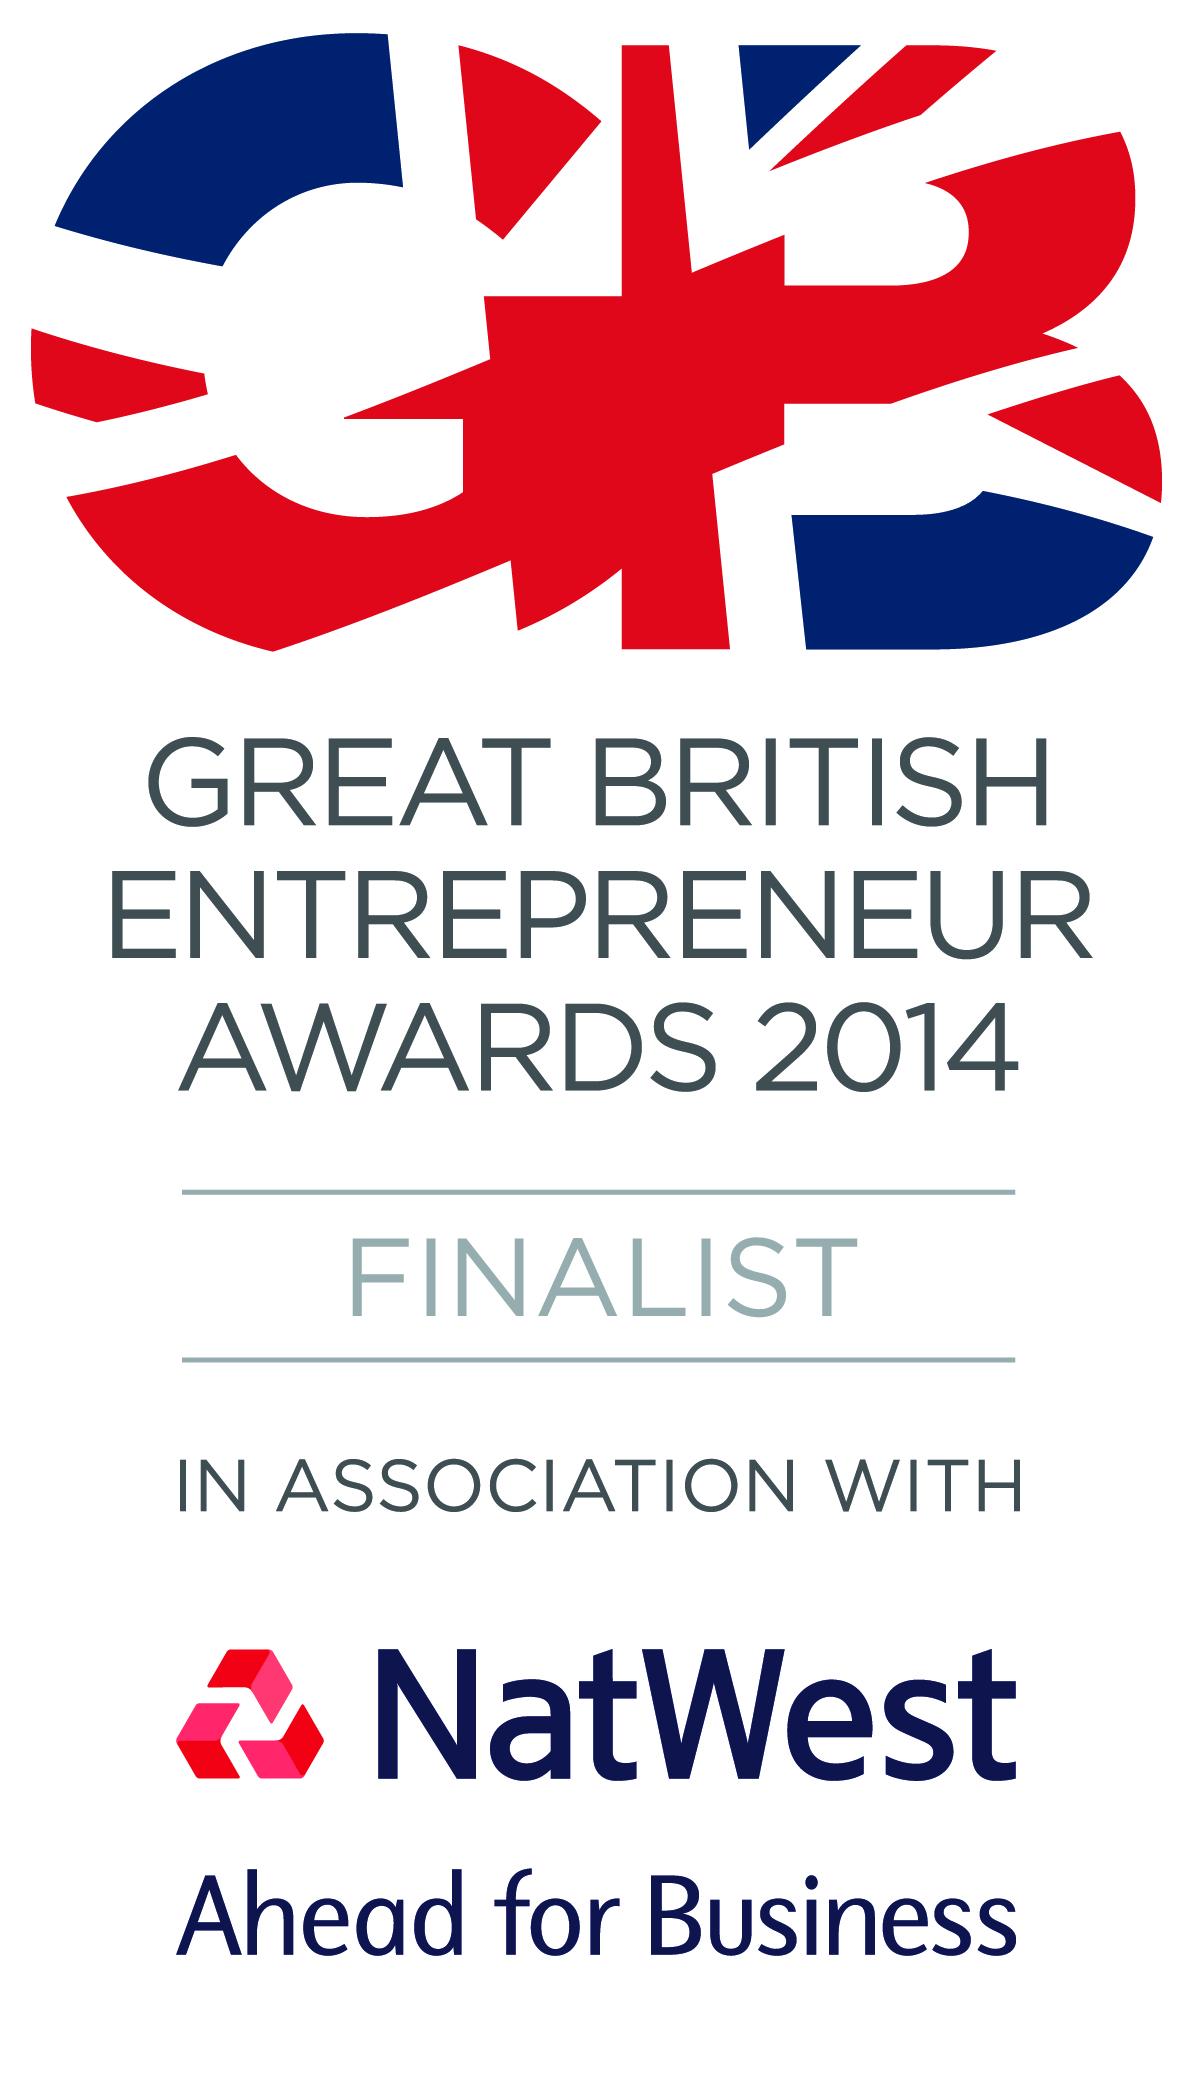 Caroline_brealey_matchmaker_finalist_great_british_entreprenuer_award